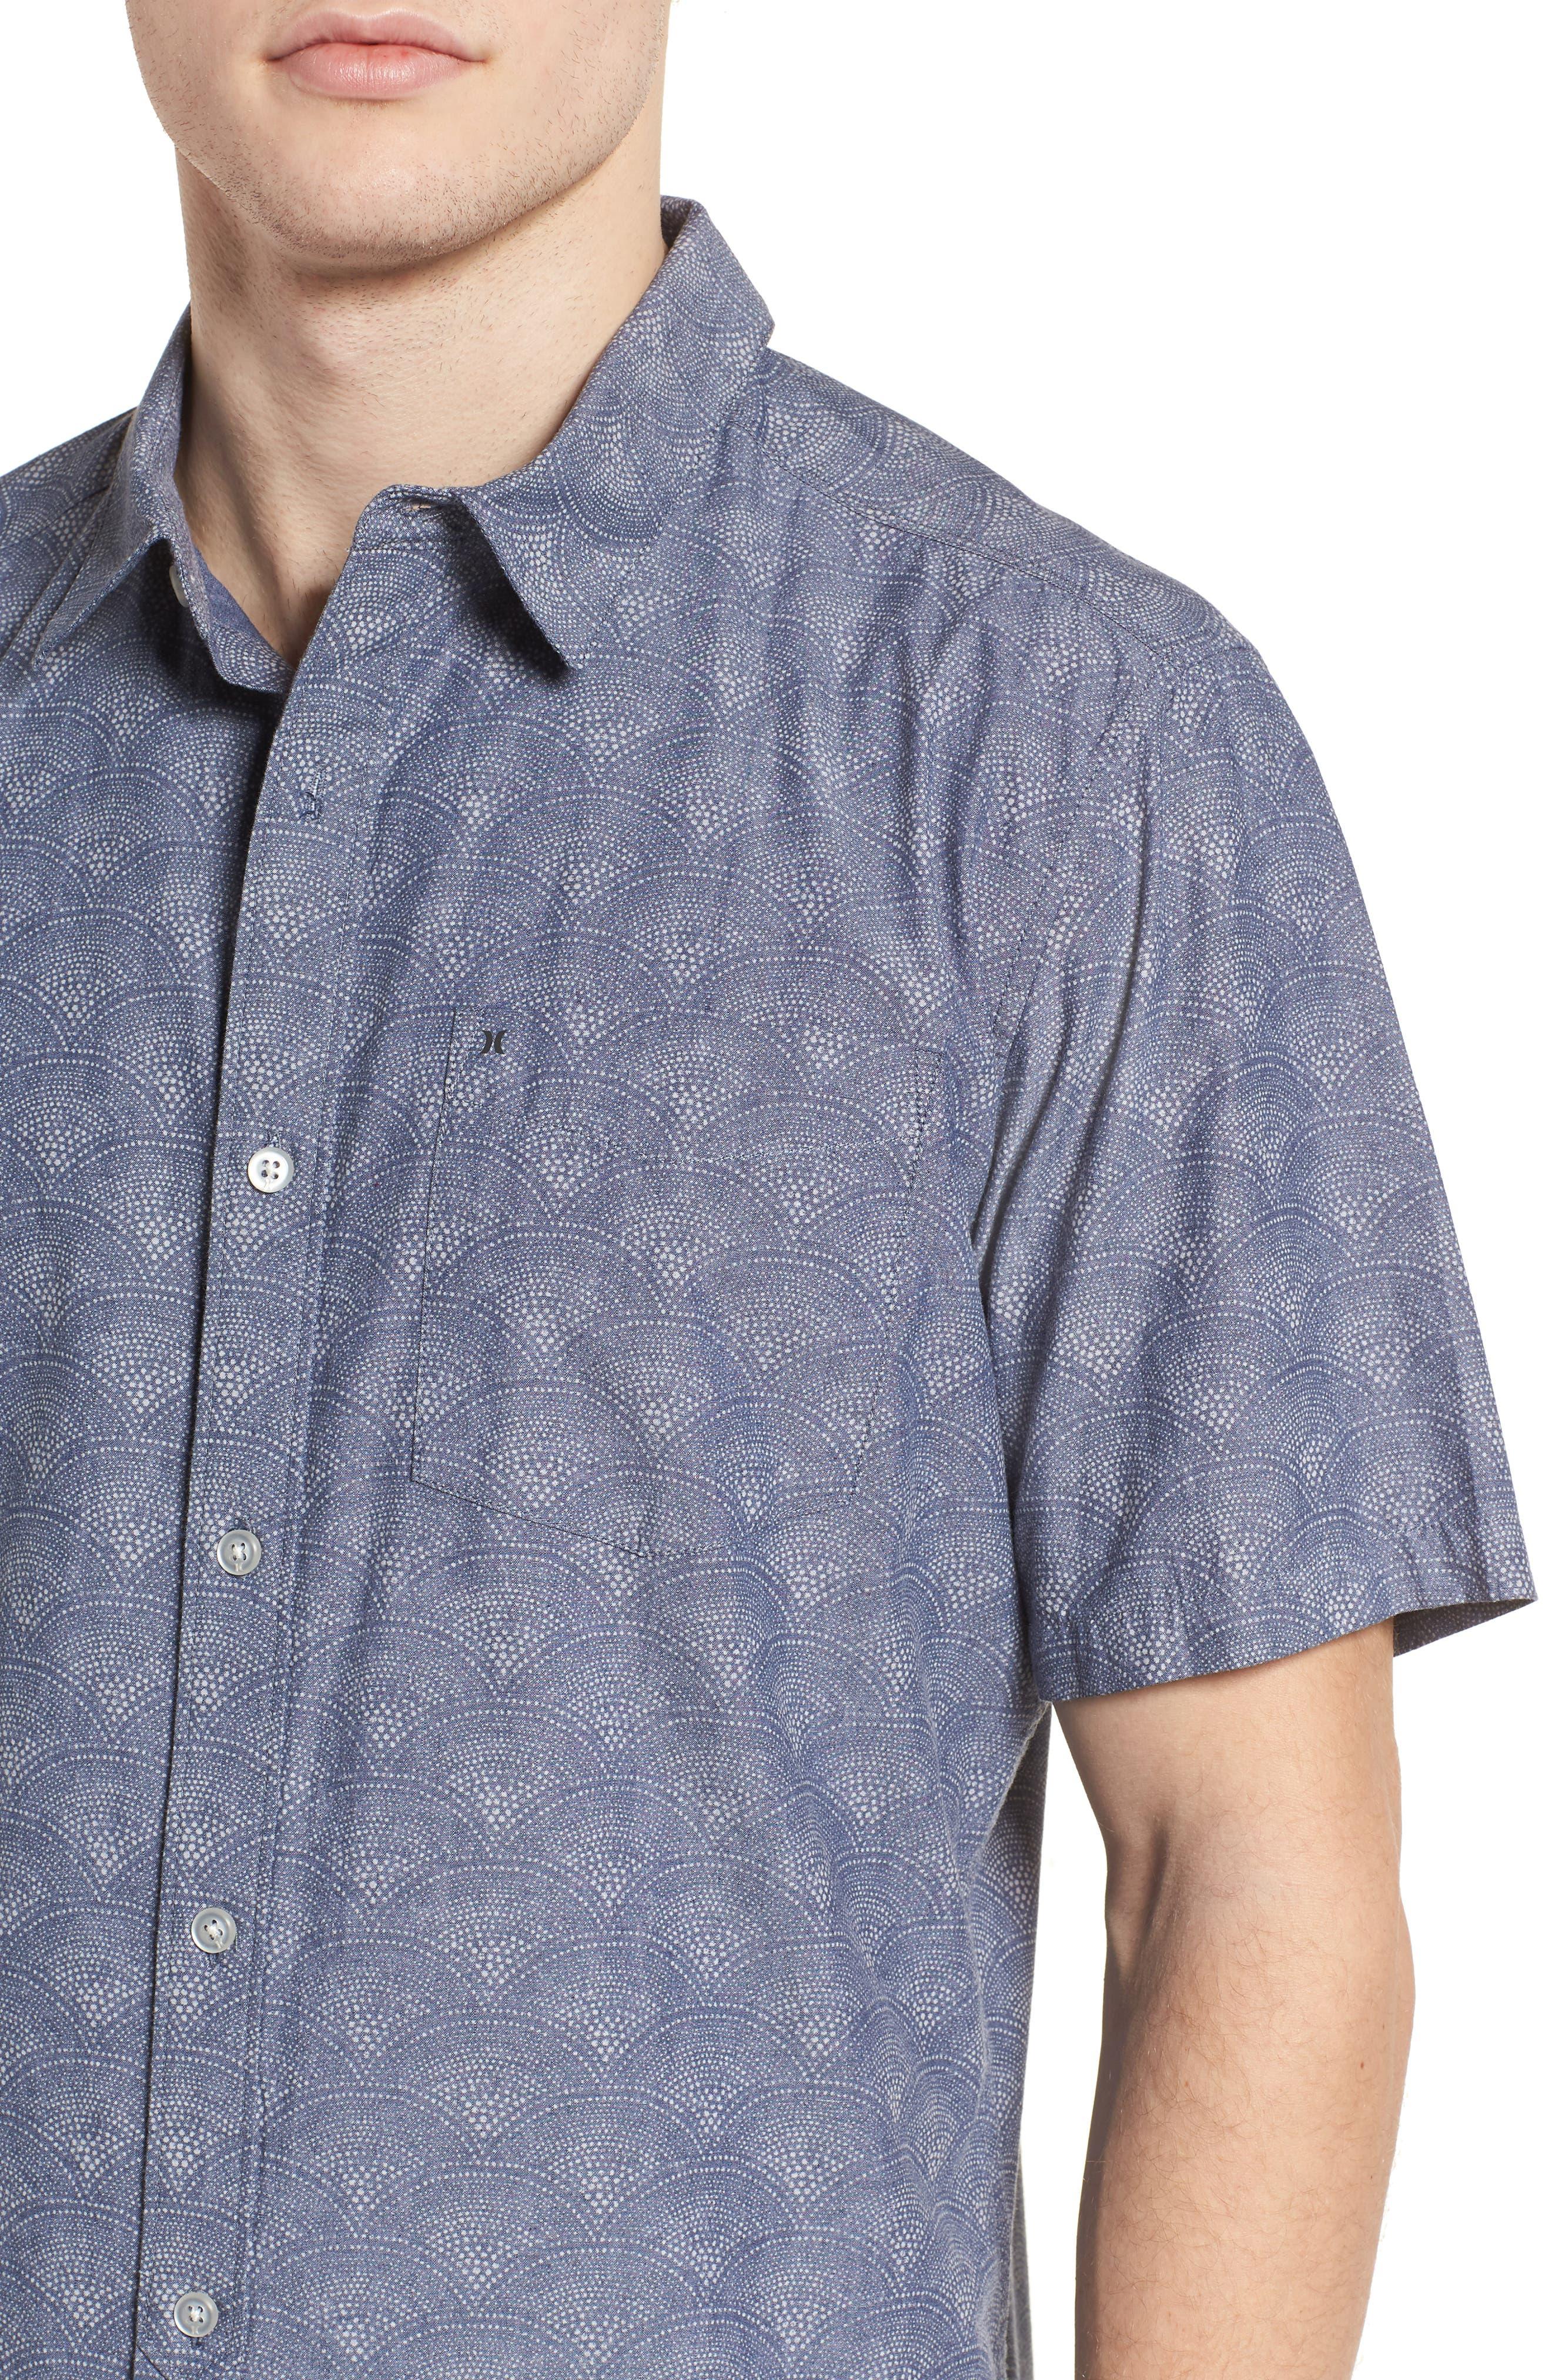 Pescado Short Sleeve Oxford Shirt,                             Alternate thumbnail 4, color,                             Obsidian